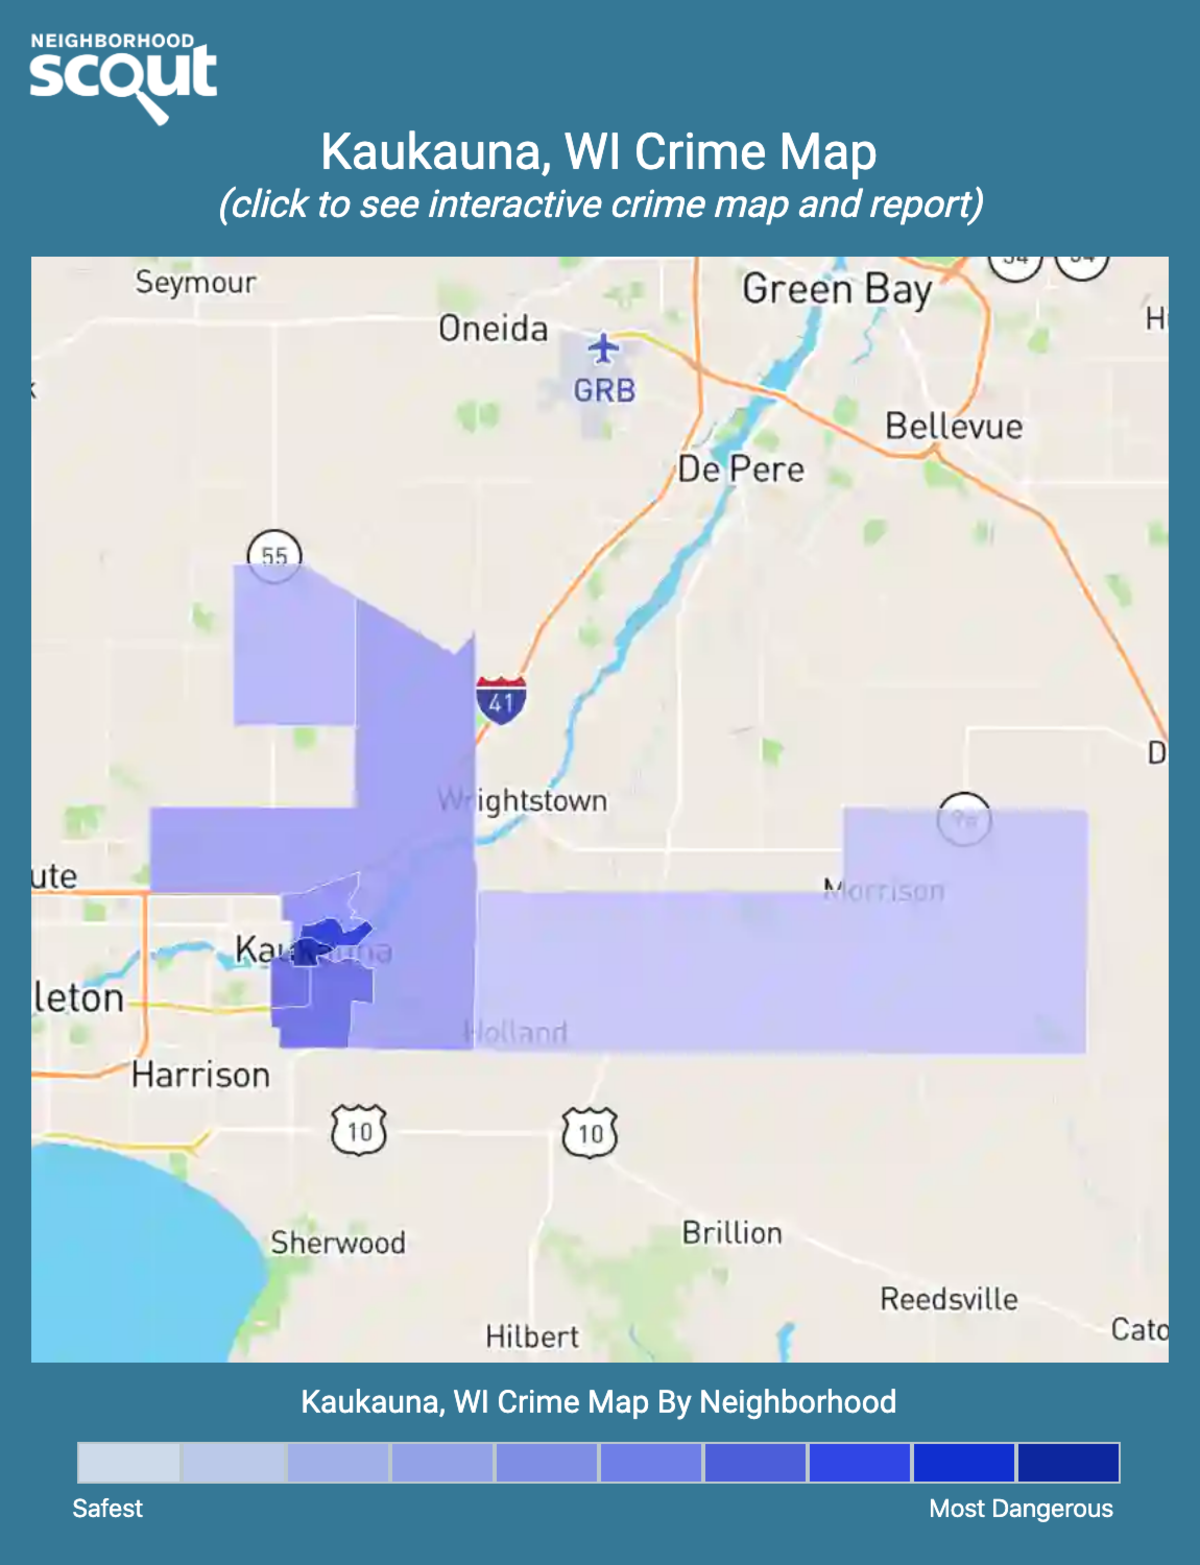 Kaukauna, Wisconsin crime map